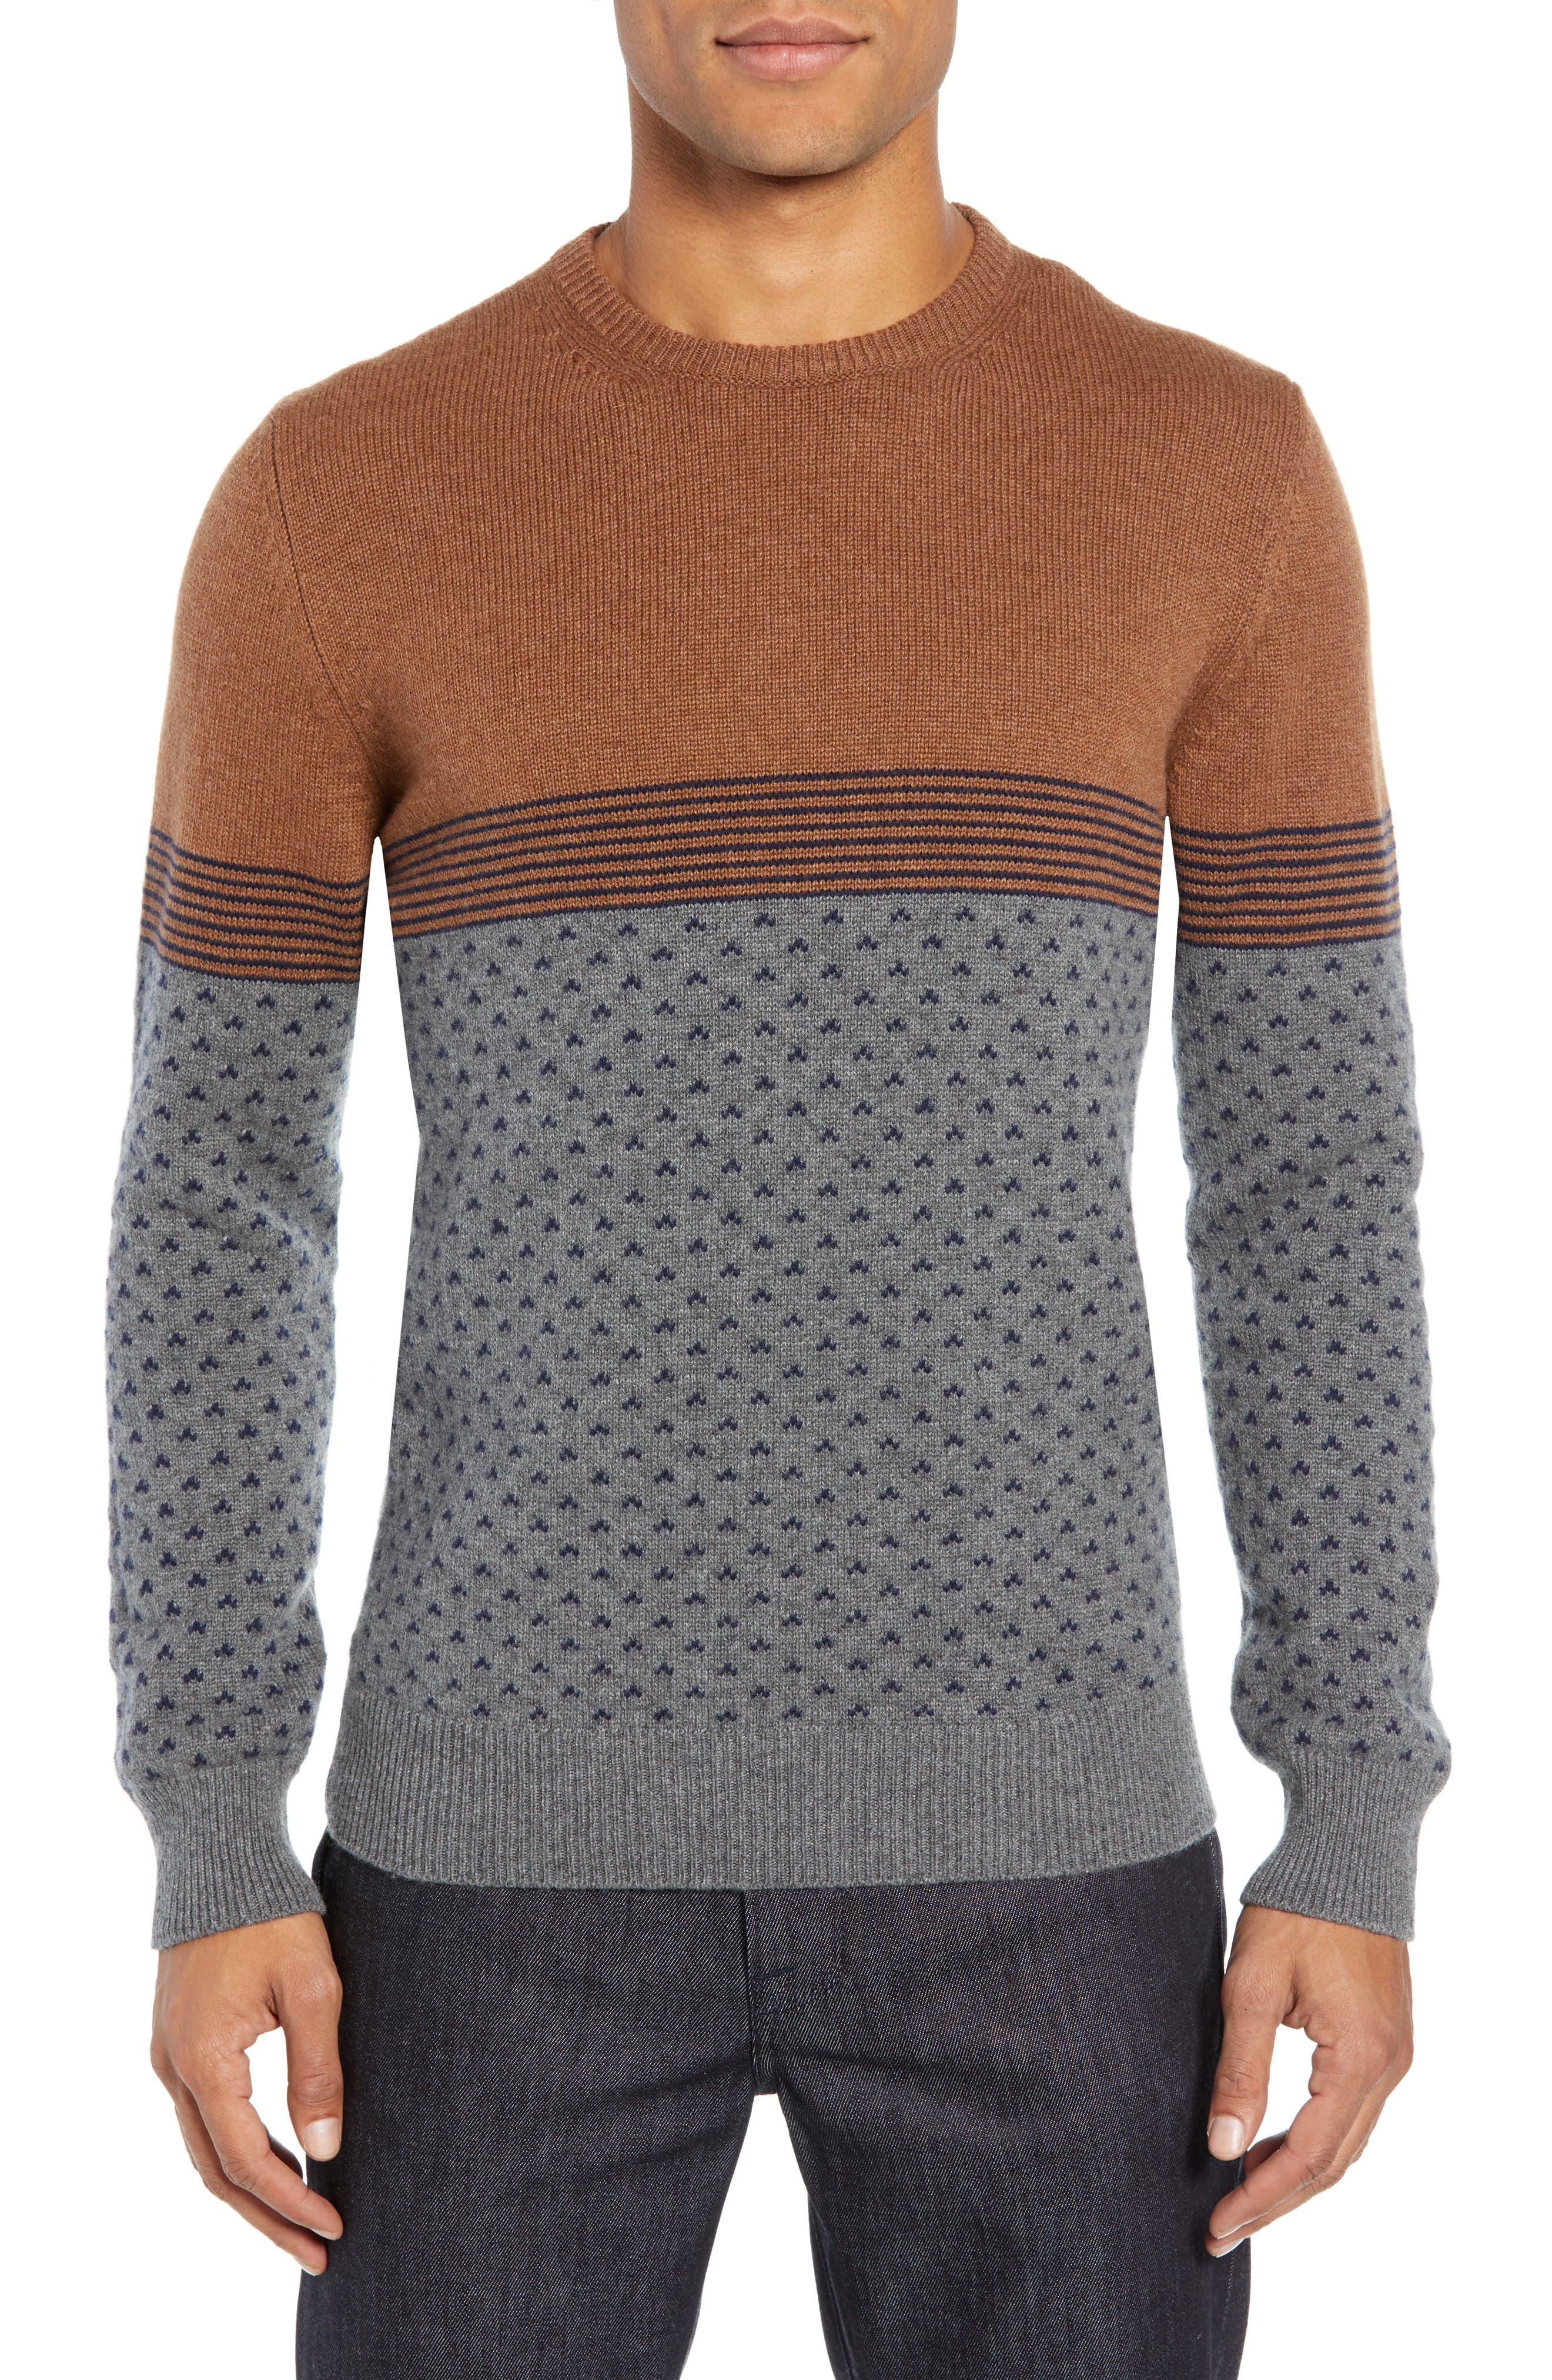 Trim Fit Cashmere Sweater,                             Main thumbnail 1, color,                             GREY